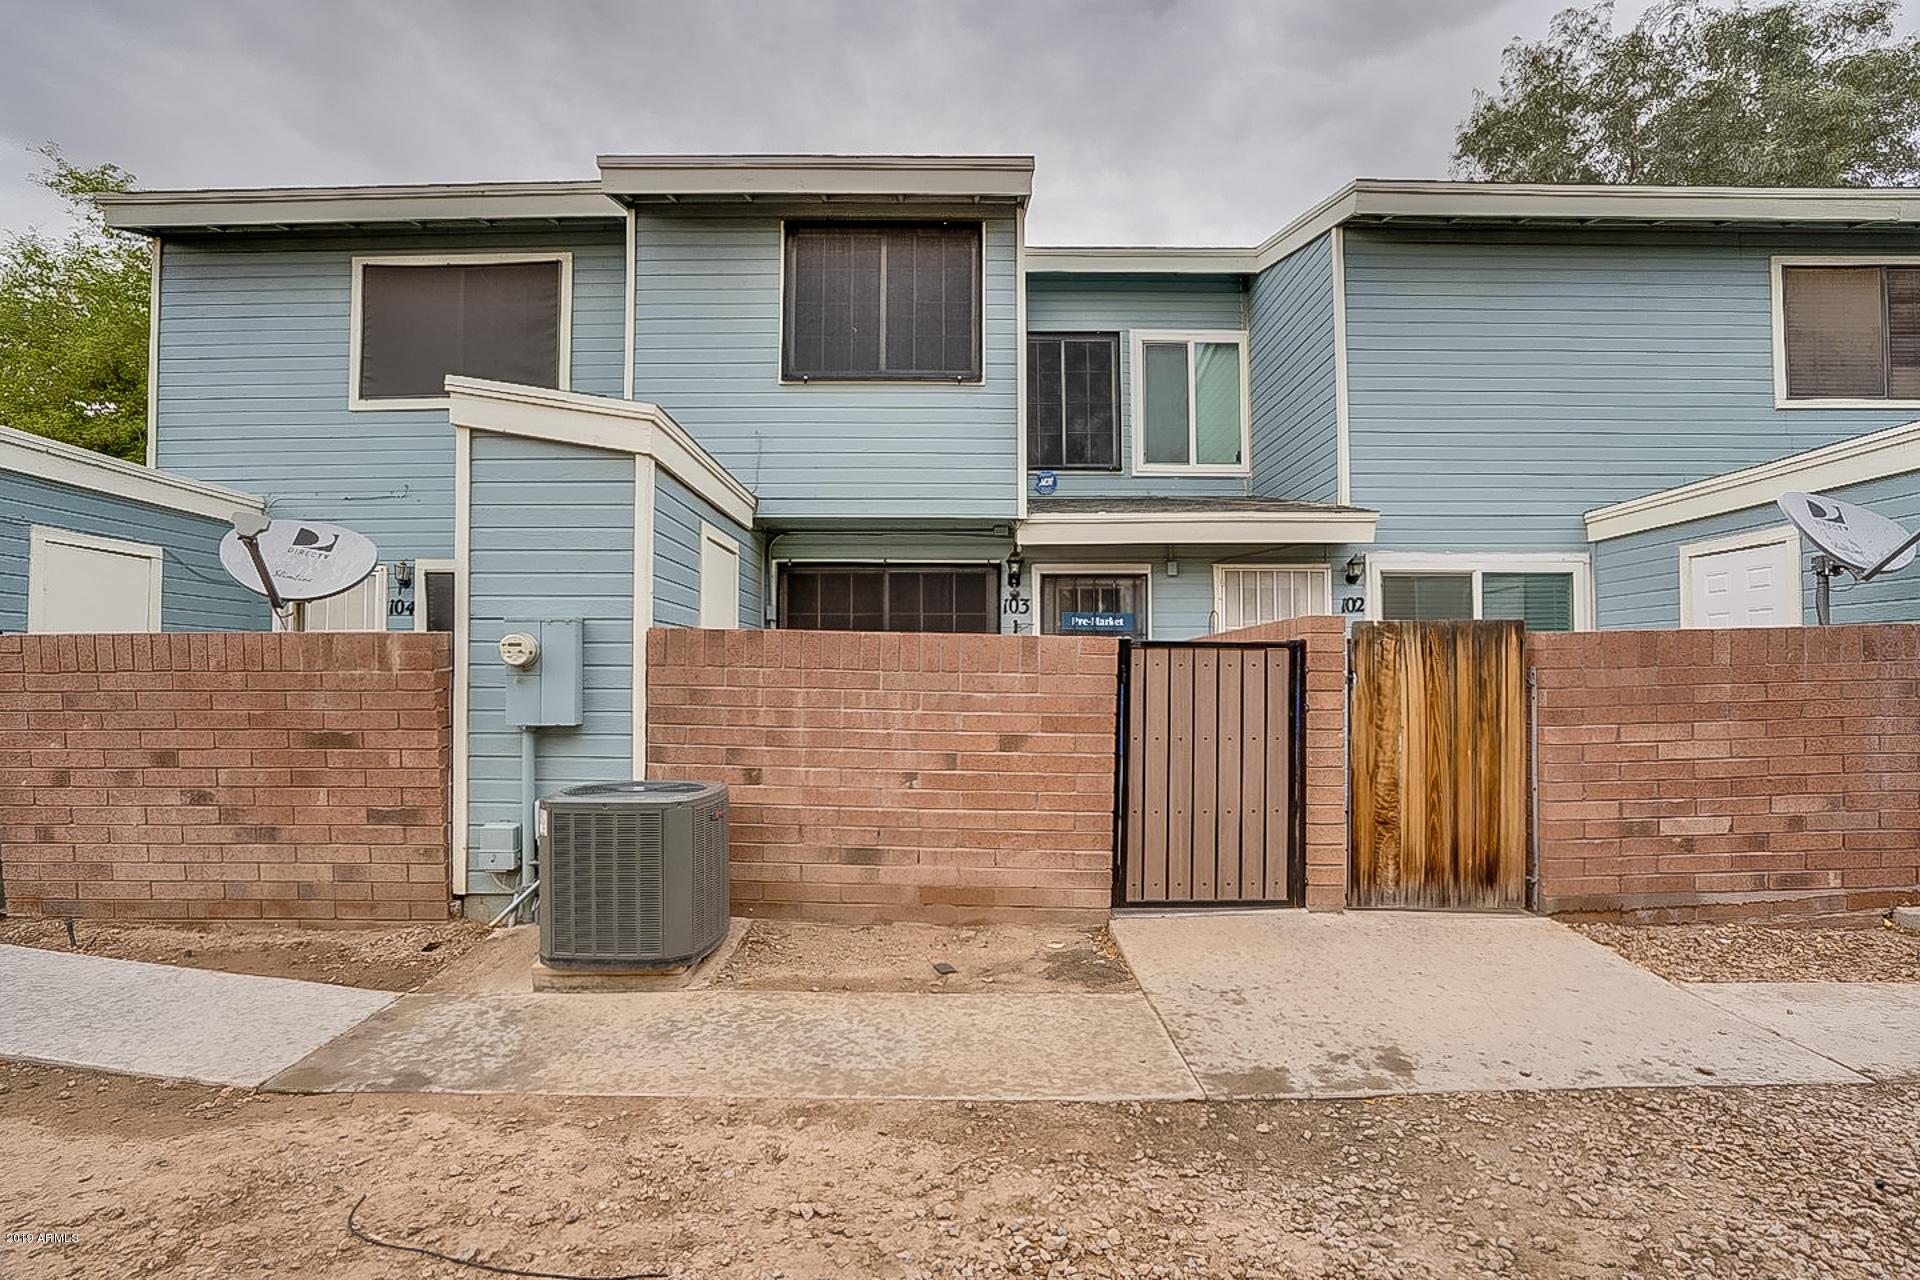 Photo of 510 N ALMA SCHOOL Road #103, Mesa, AZ 85201